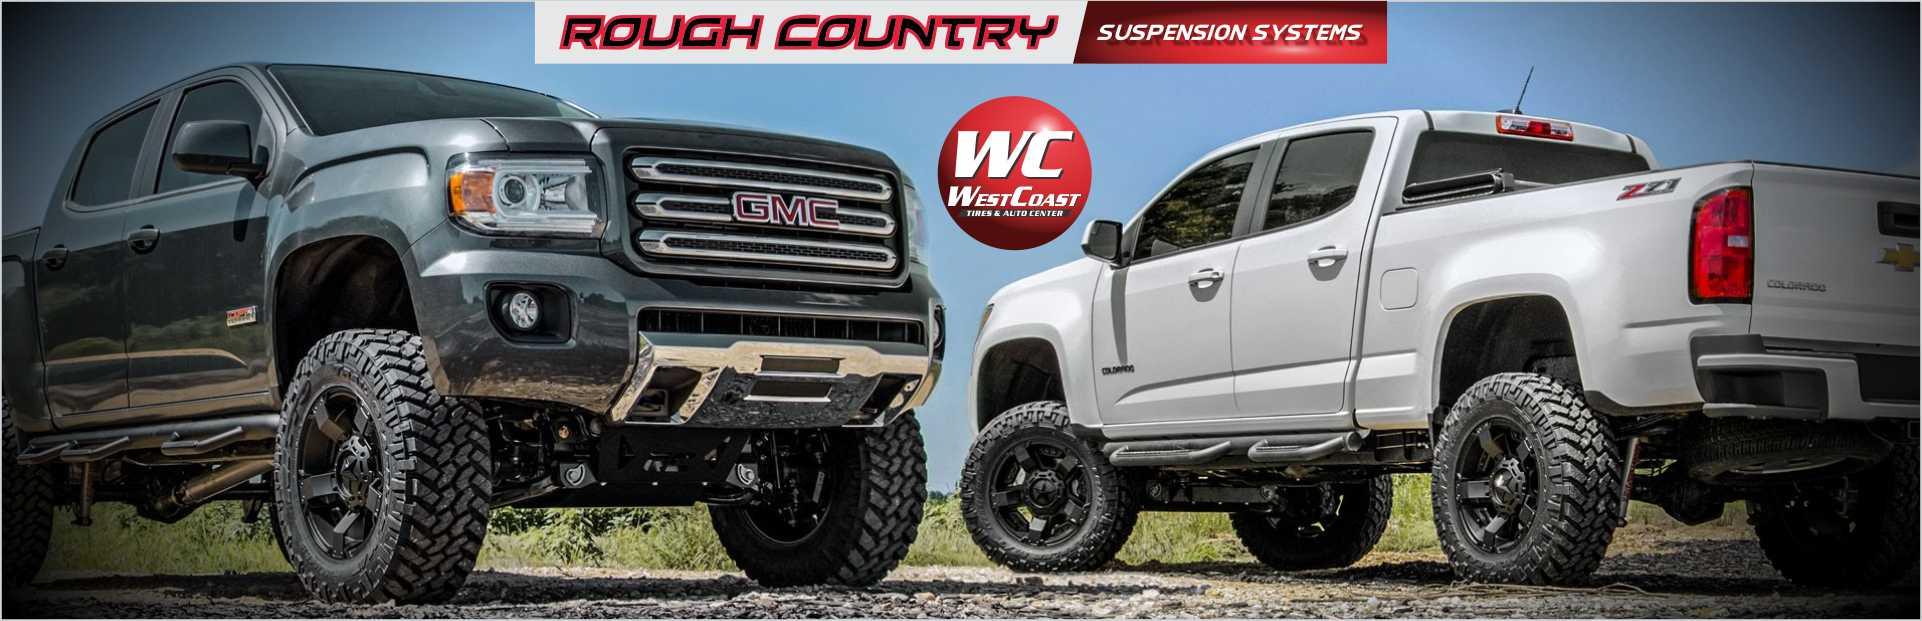 West Coast Auto >> West Coast Tires Auto Center Provides Premium Auto